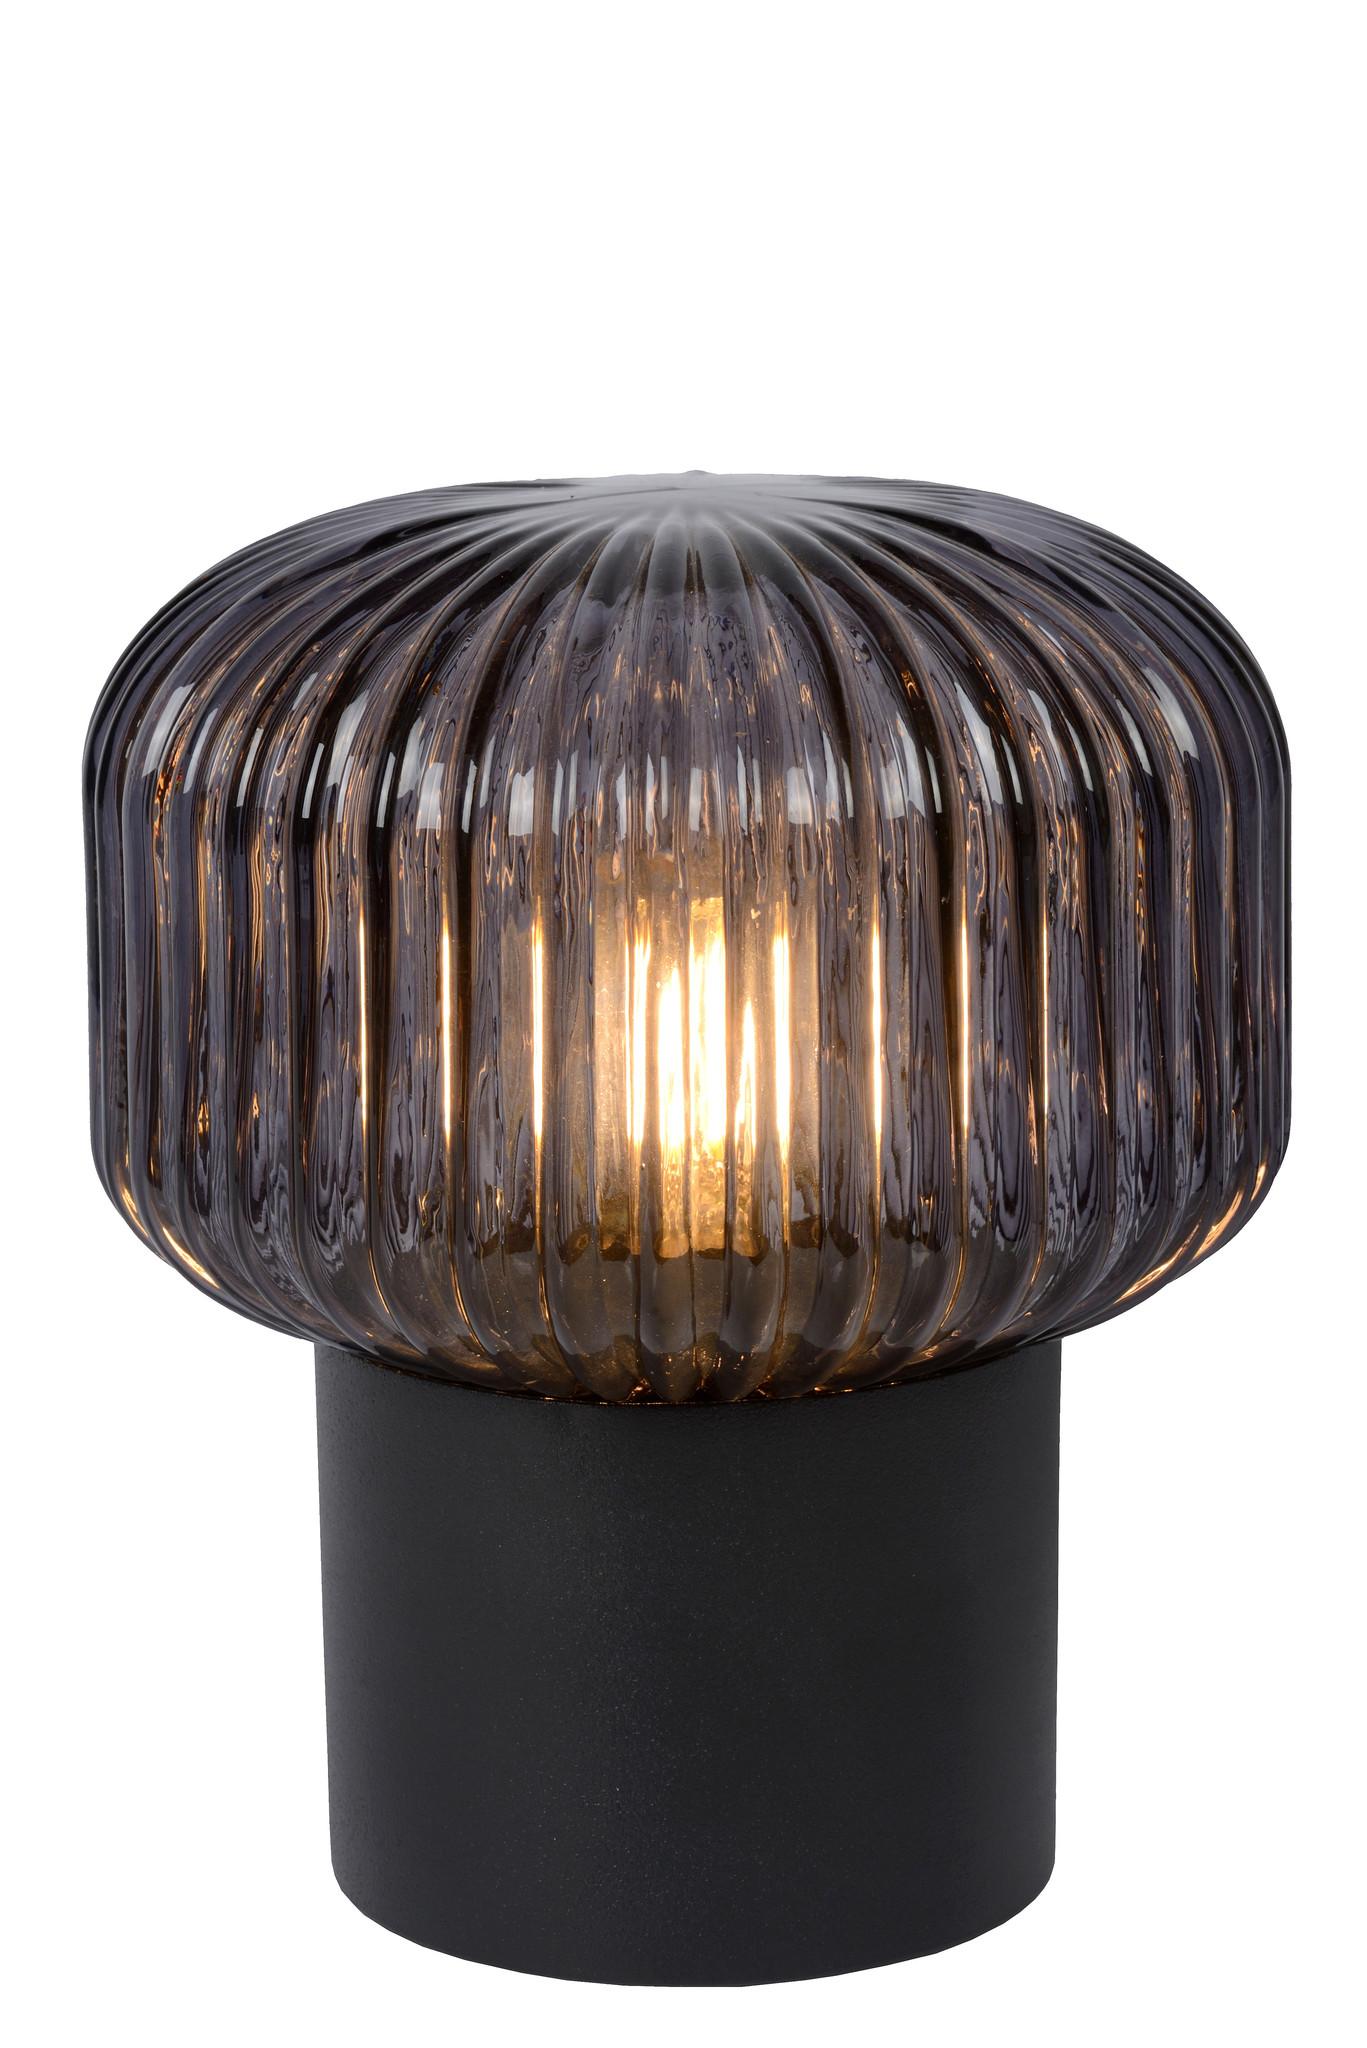 Lucide JANY Tafellamp-Zwart-Ø16-1xE14-40W-Glas